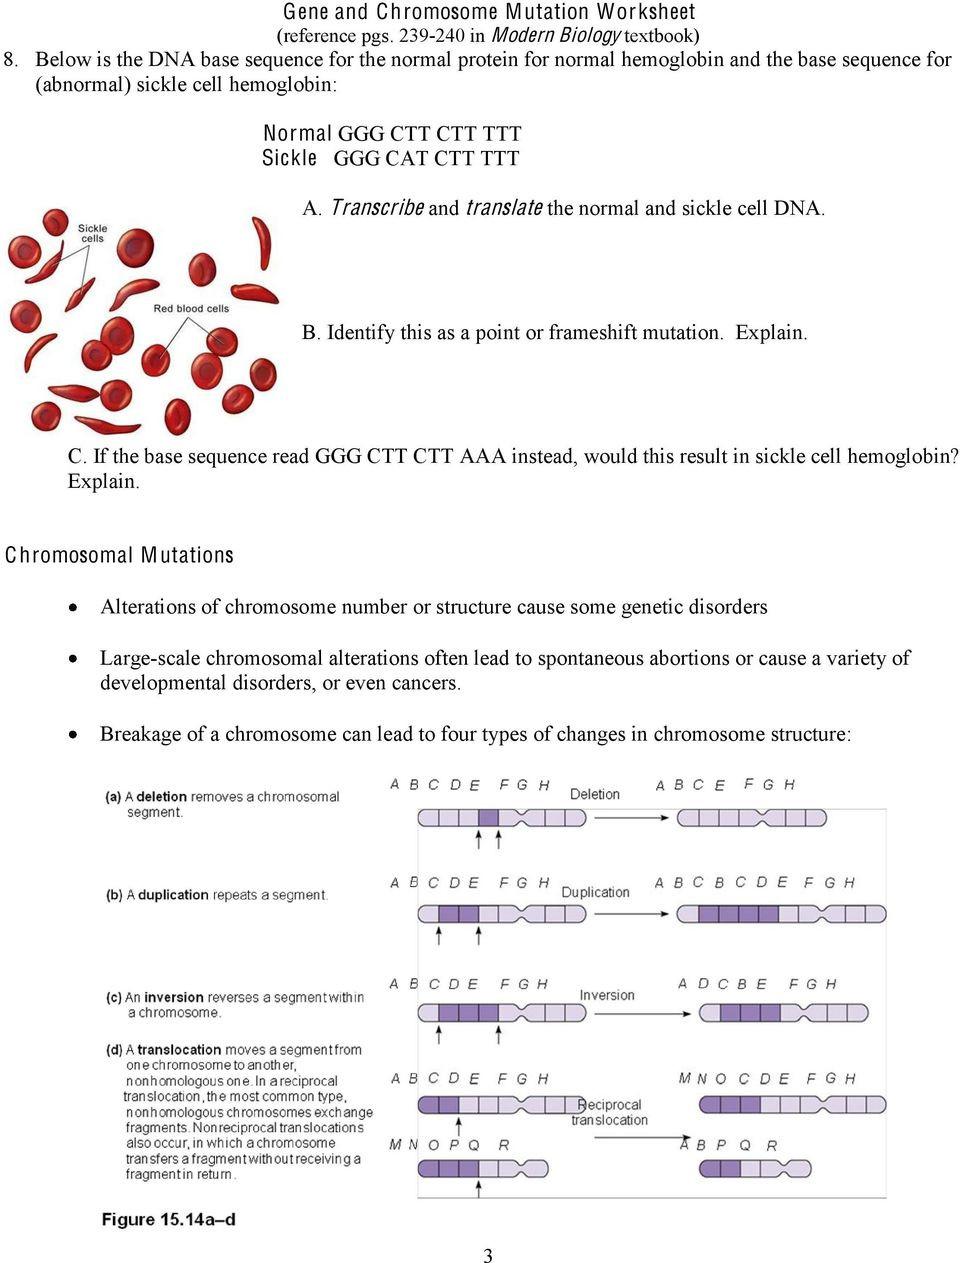 Genetic Mutation Worksheet Answer Key Gene and Chromosome Mutation Worksheet Reference Pgs In